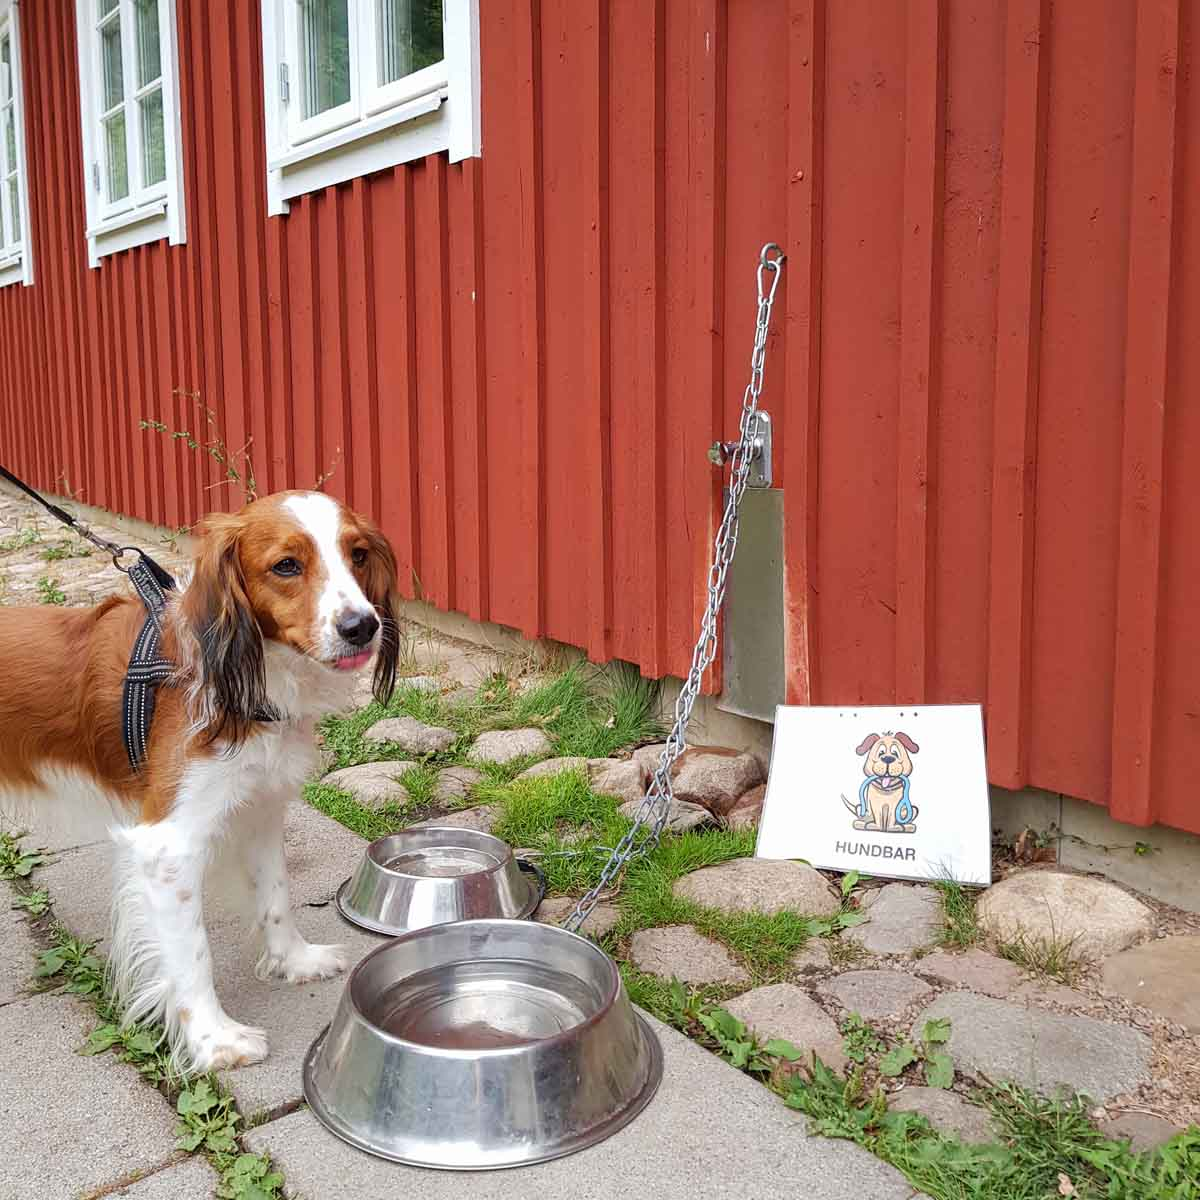 Hond mee naar Nationaal Park Söderåsen